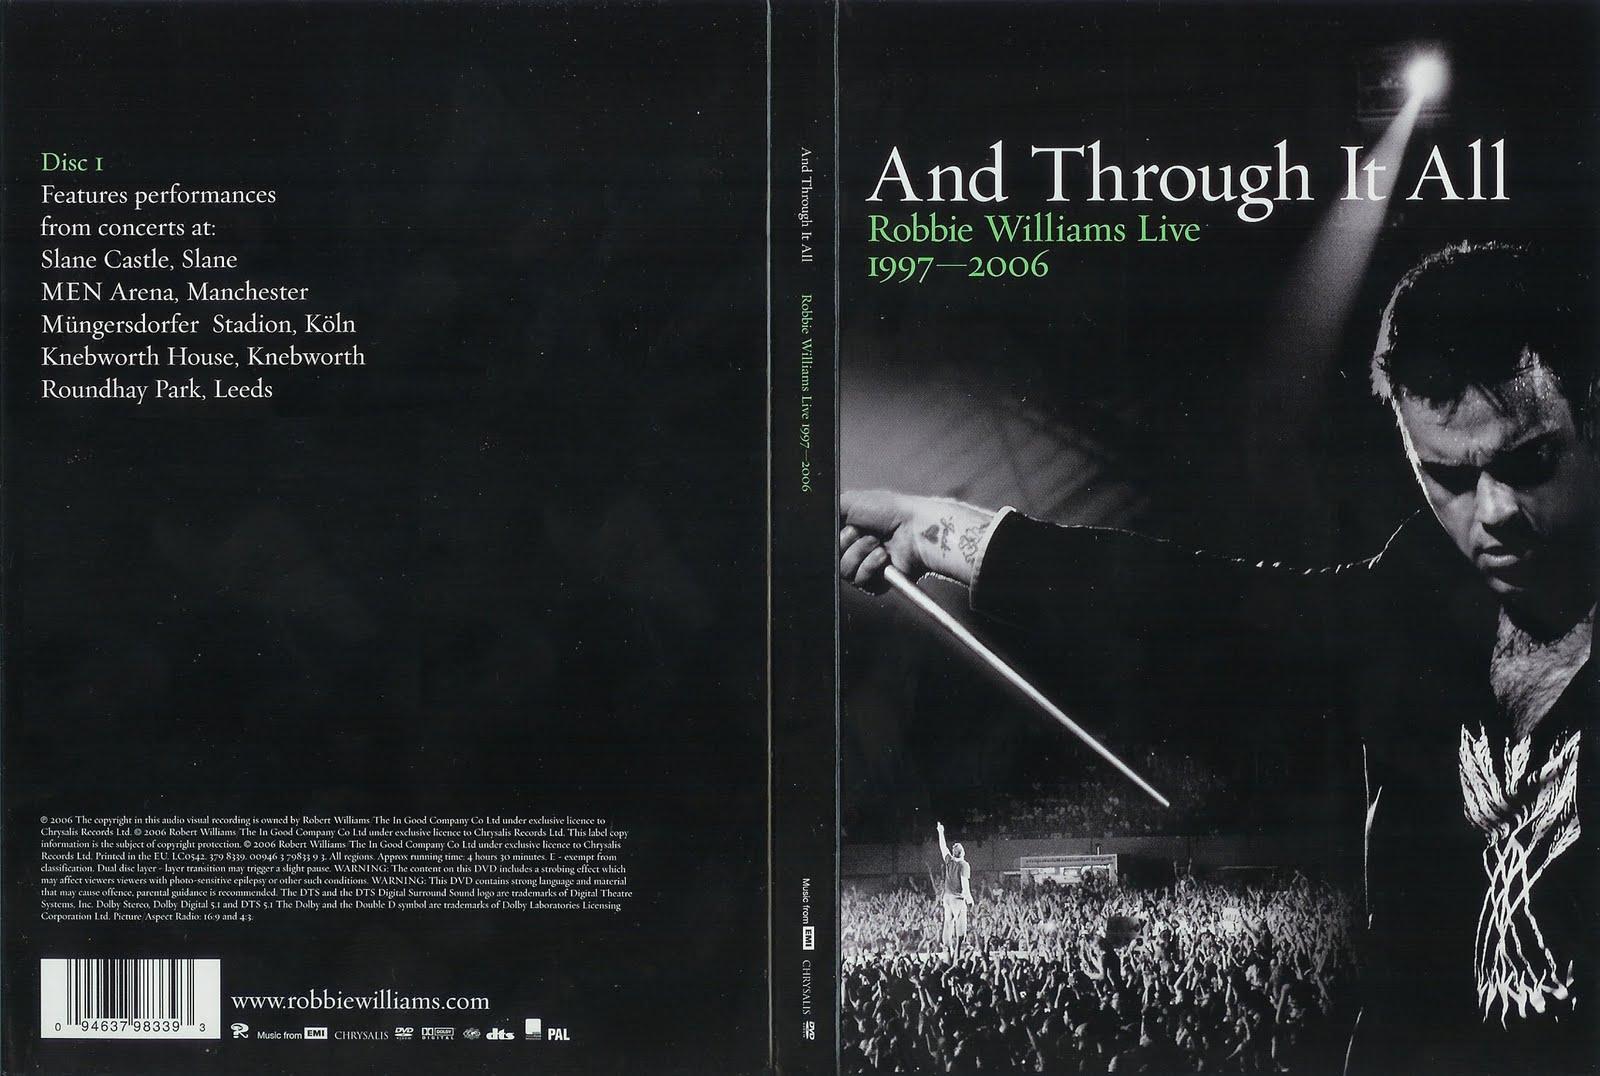 http://3.bp.blogspot.com/_PiUVny6RPwY/S8ytk_MFPKI/AAAAAAAAAkY/v2xBHEJVaPQ/s1600/Robbie+Williams+-+And+Through+It+All+Live+1997-2006+-+DVD+1.jpg